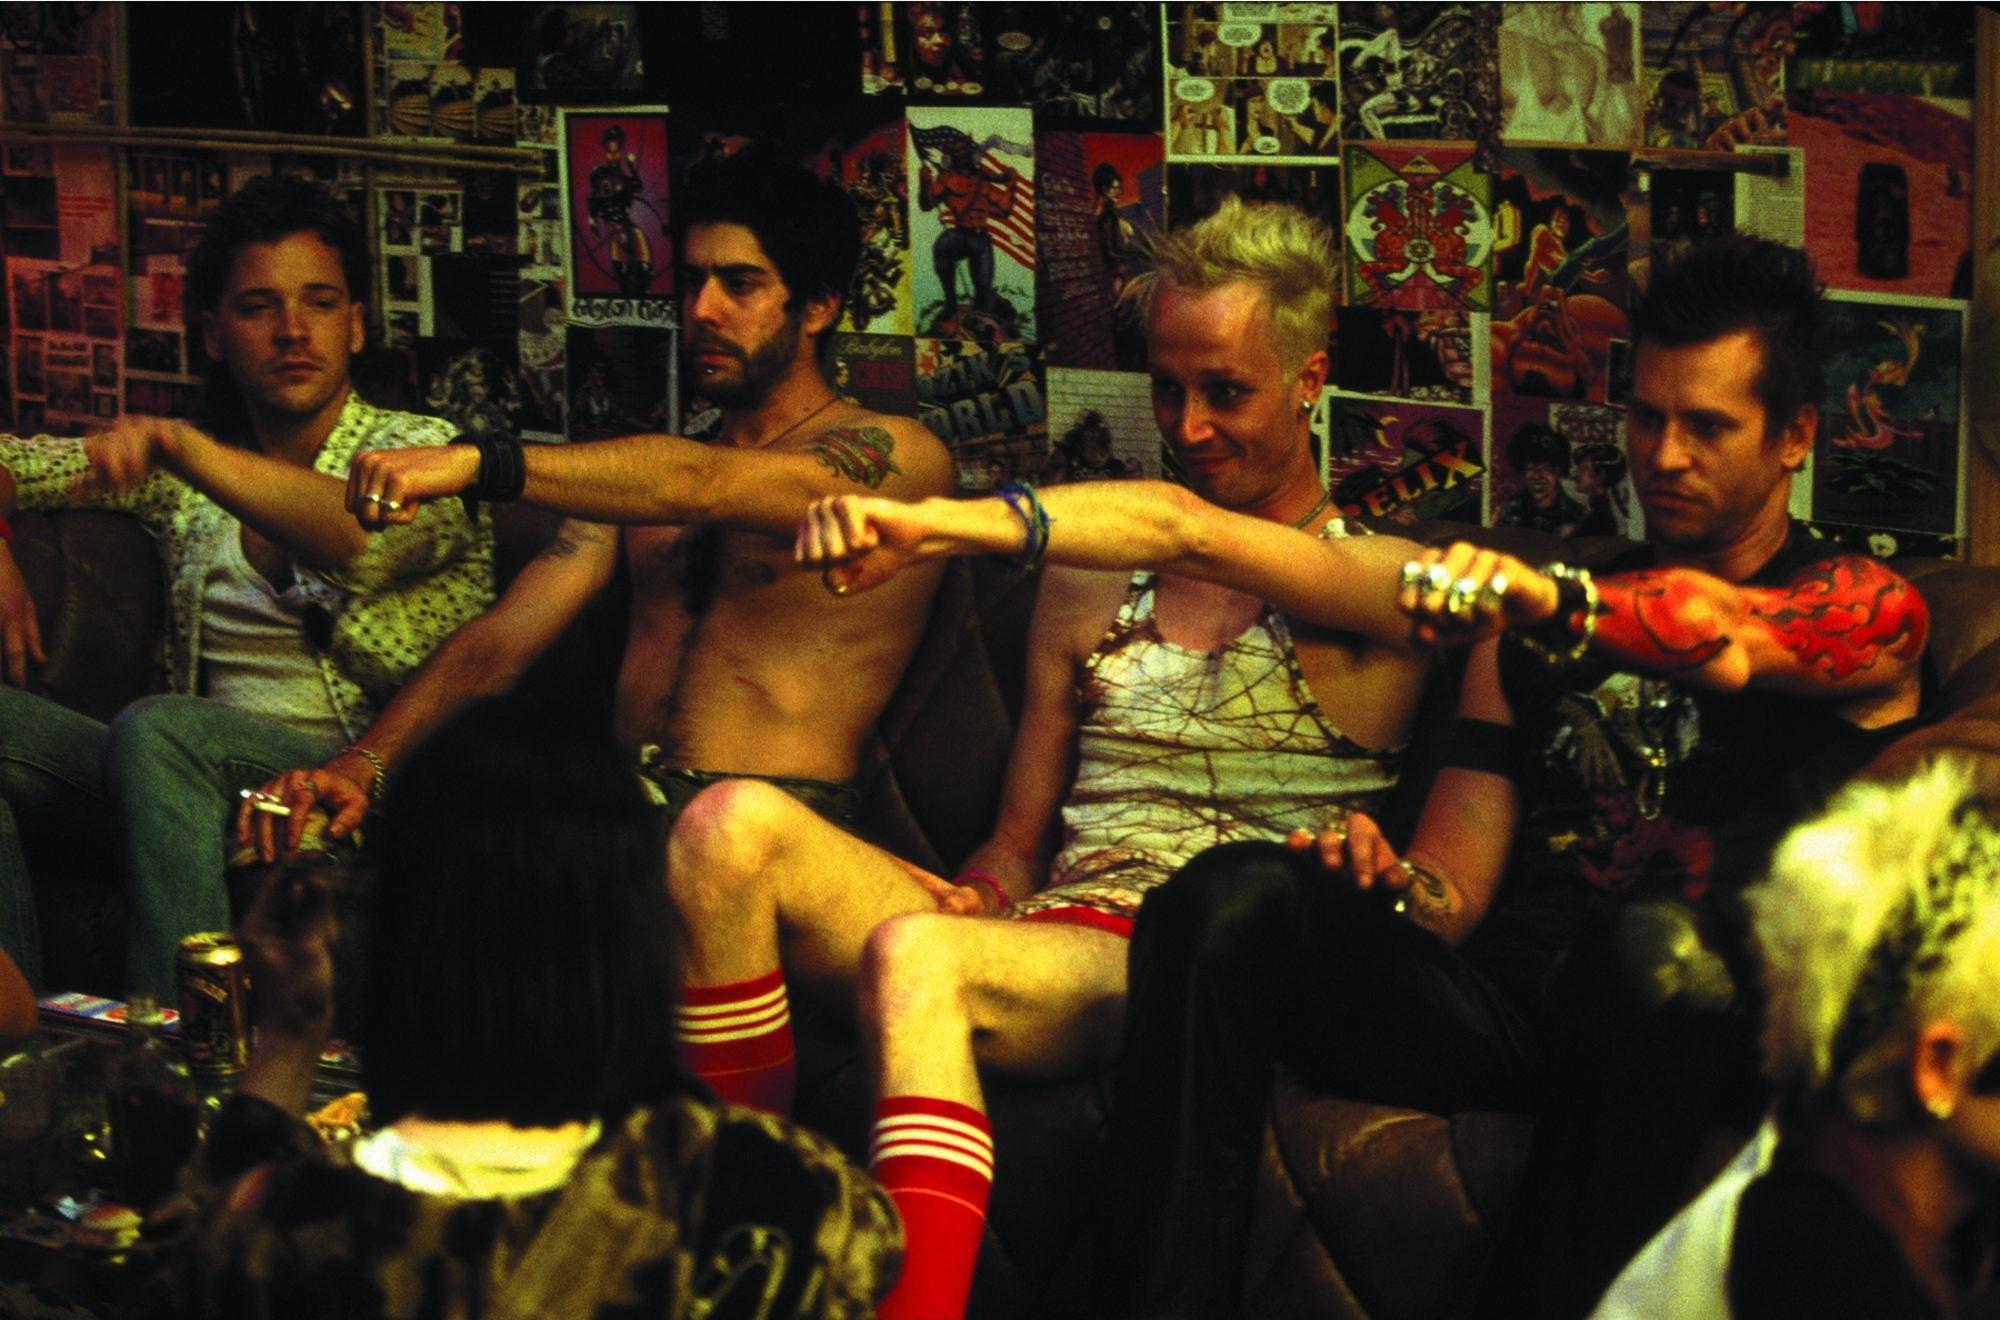 Val Kilmer, Adam Goldberg, Peter Sarsgaard, and Ricky Trammell in The Salton Sea (2002)